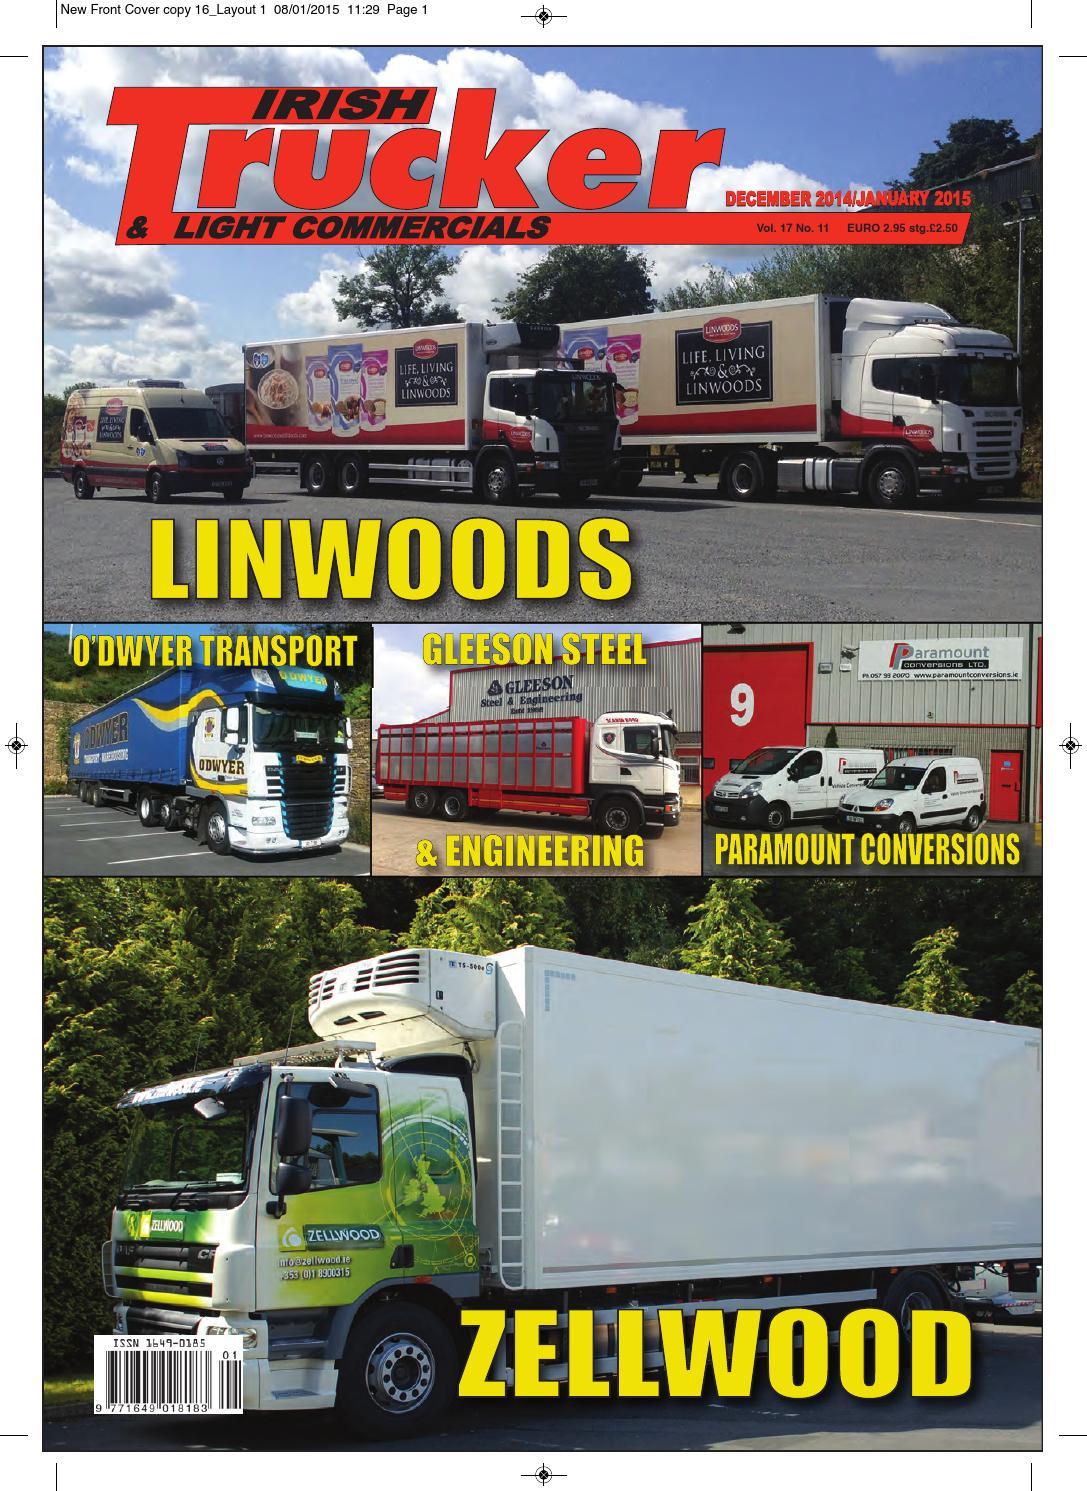 Fermoy services - Motorway Services, Fermoy   service station